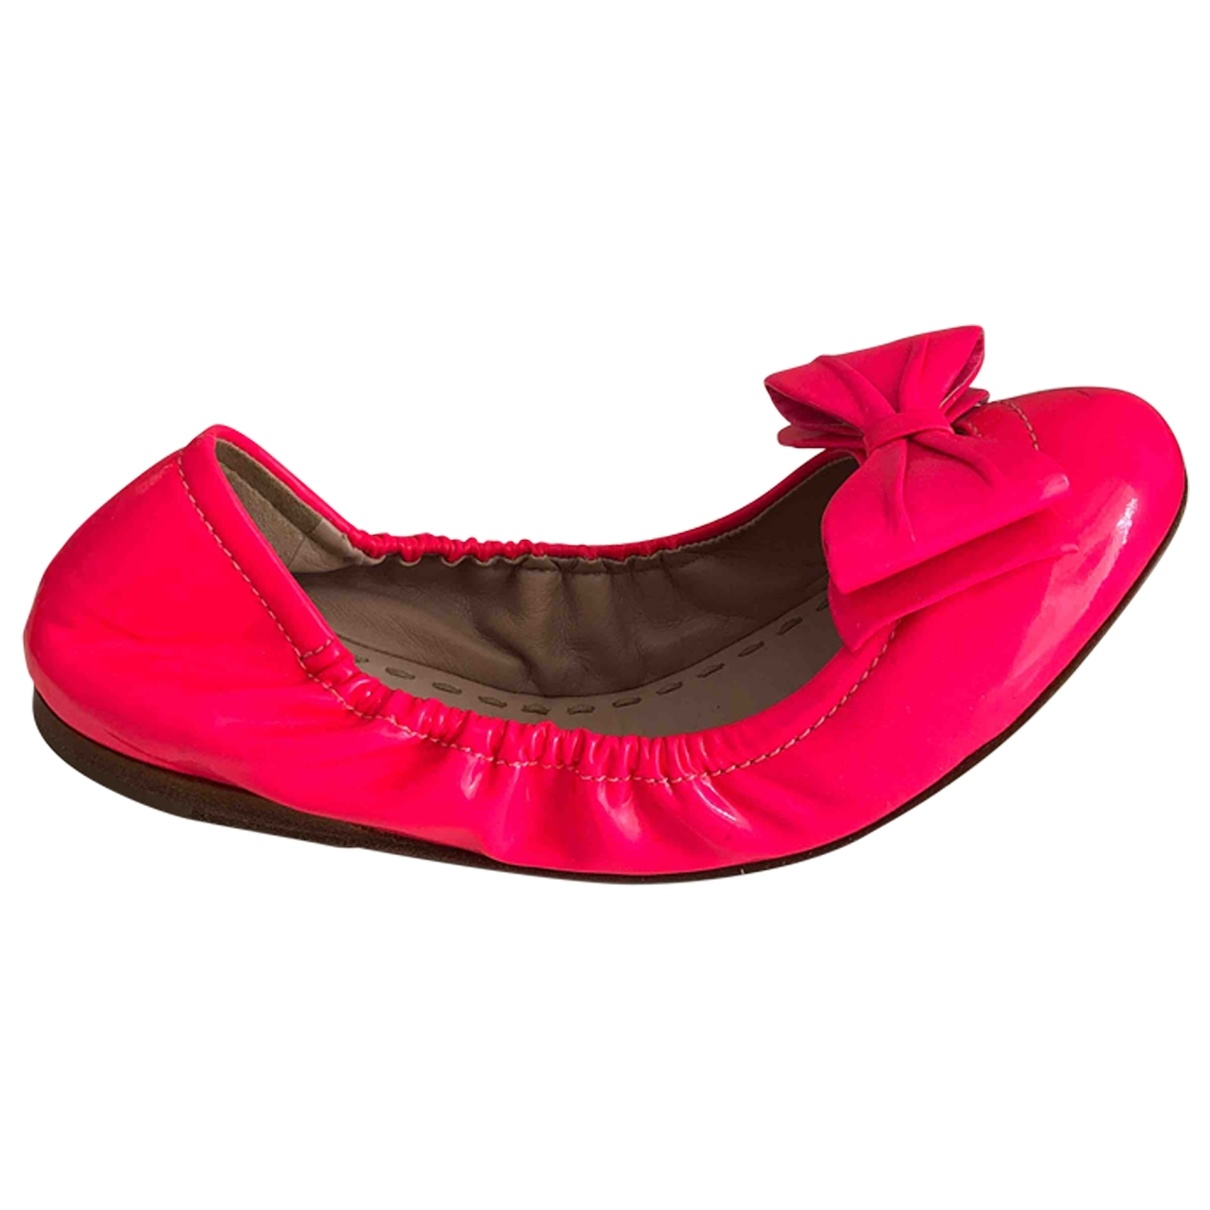 Miu Miu - Ballerines   pour femme en cuir verni - rose